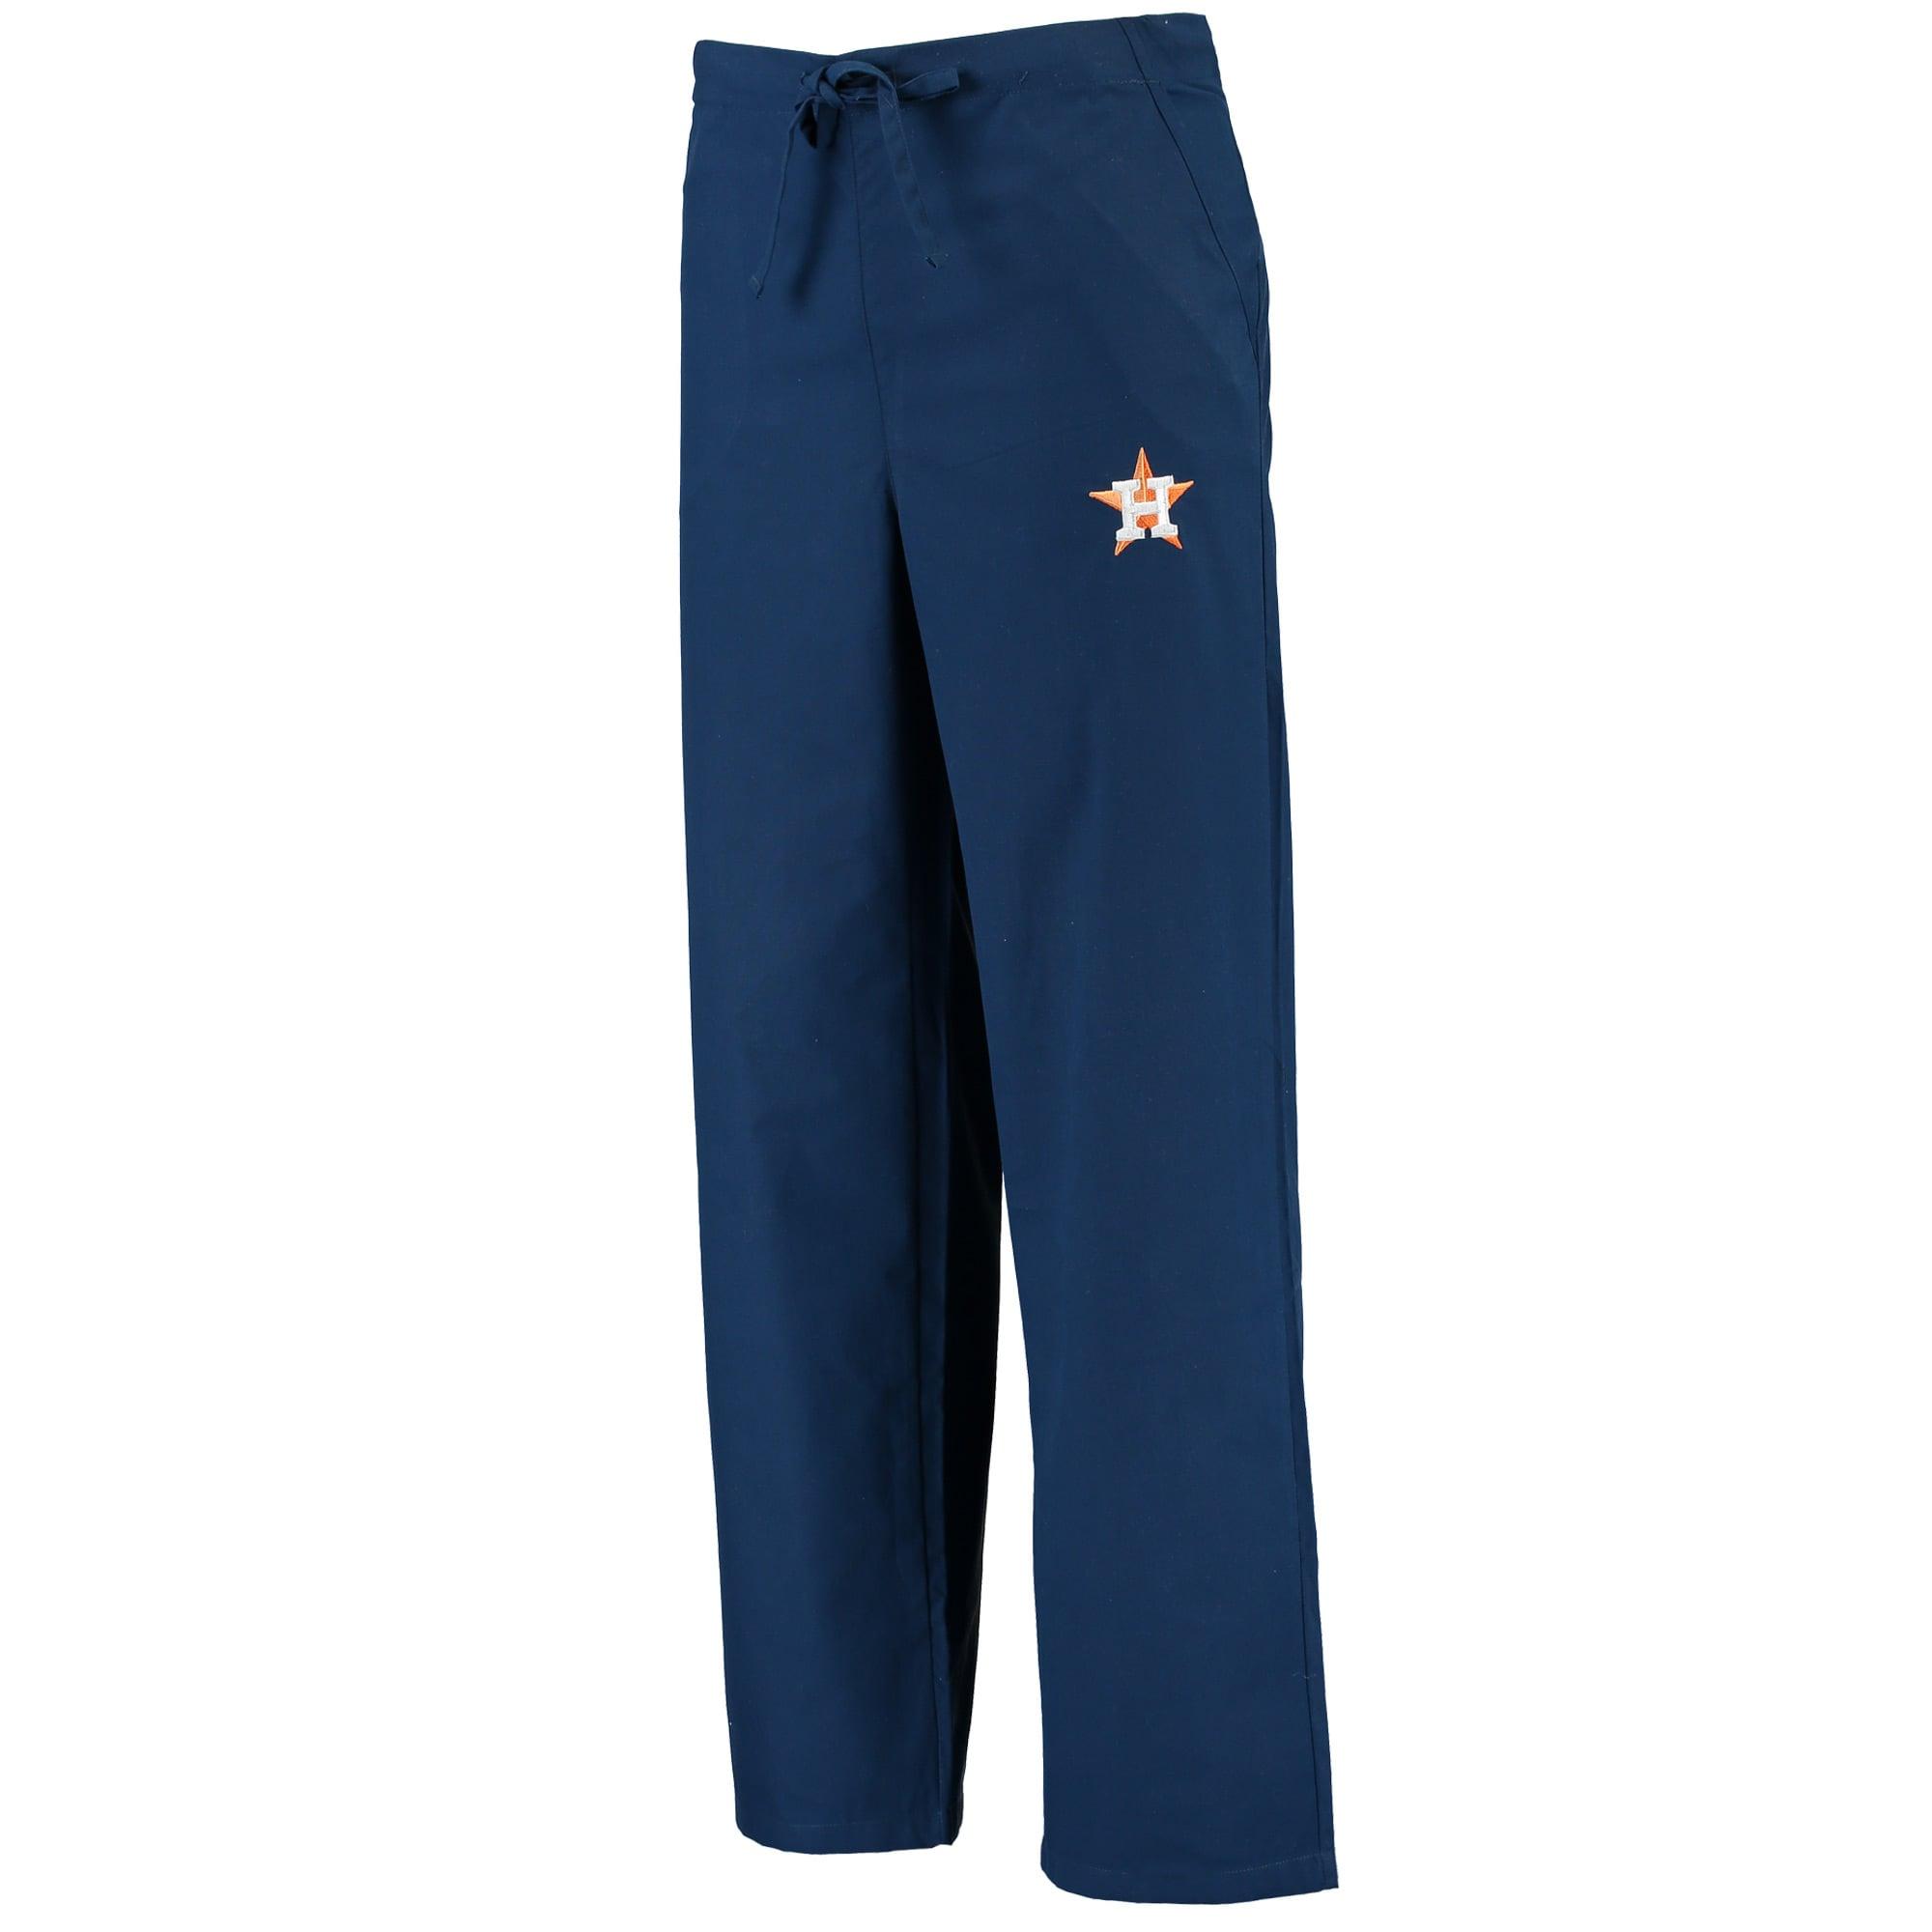 Houston Astros Concepts Sport Unisex Scrub Pants - Navy